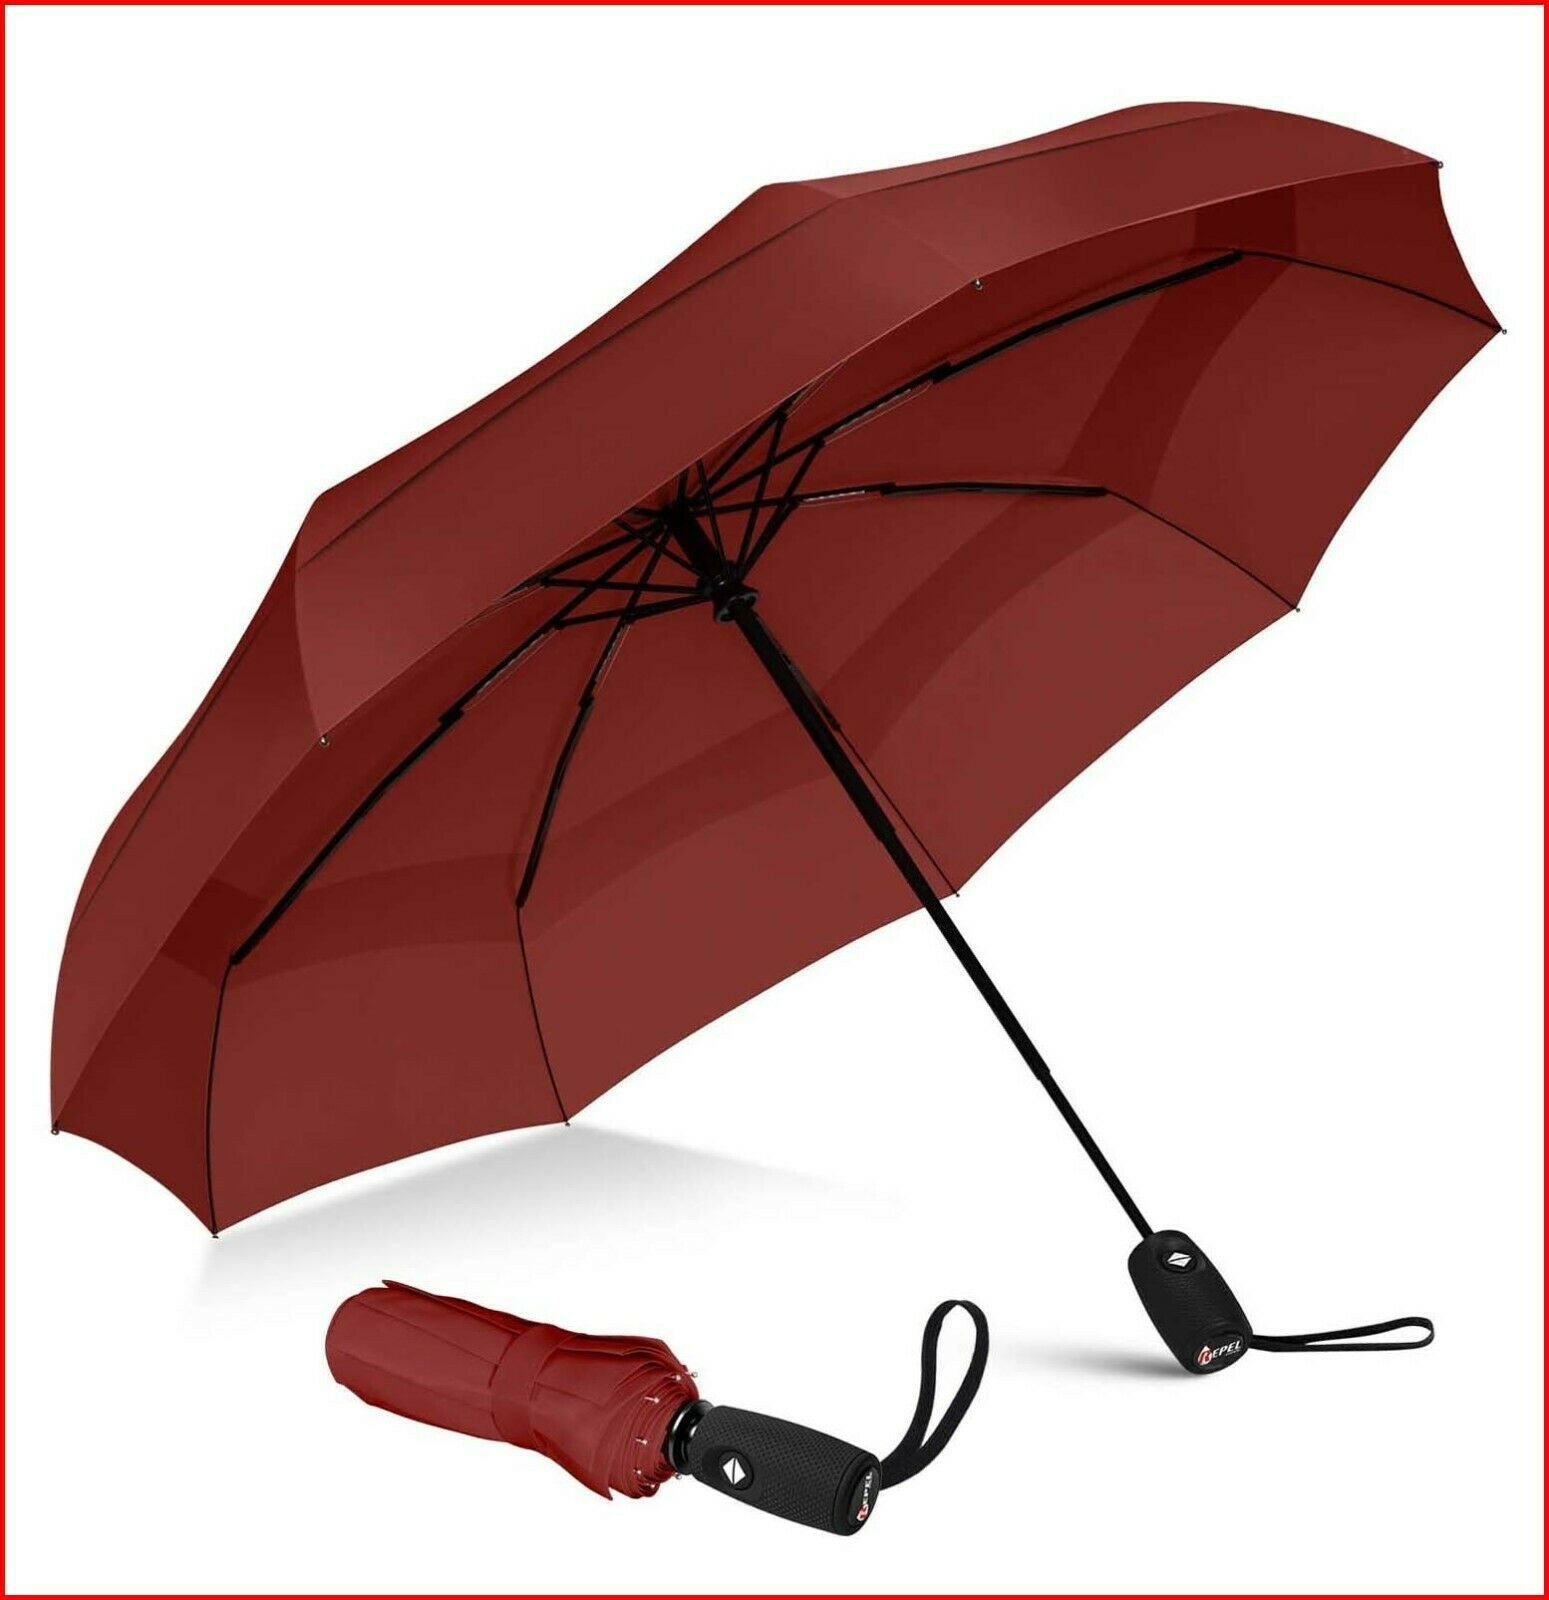 Repel Umbrella Windproof Double Vented Travel Umbrella with Teflon Coating Red